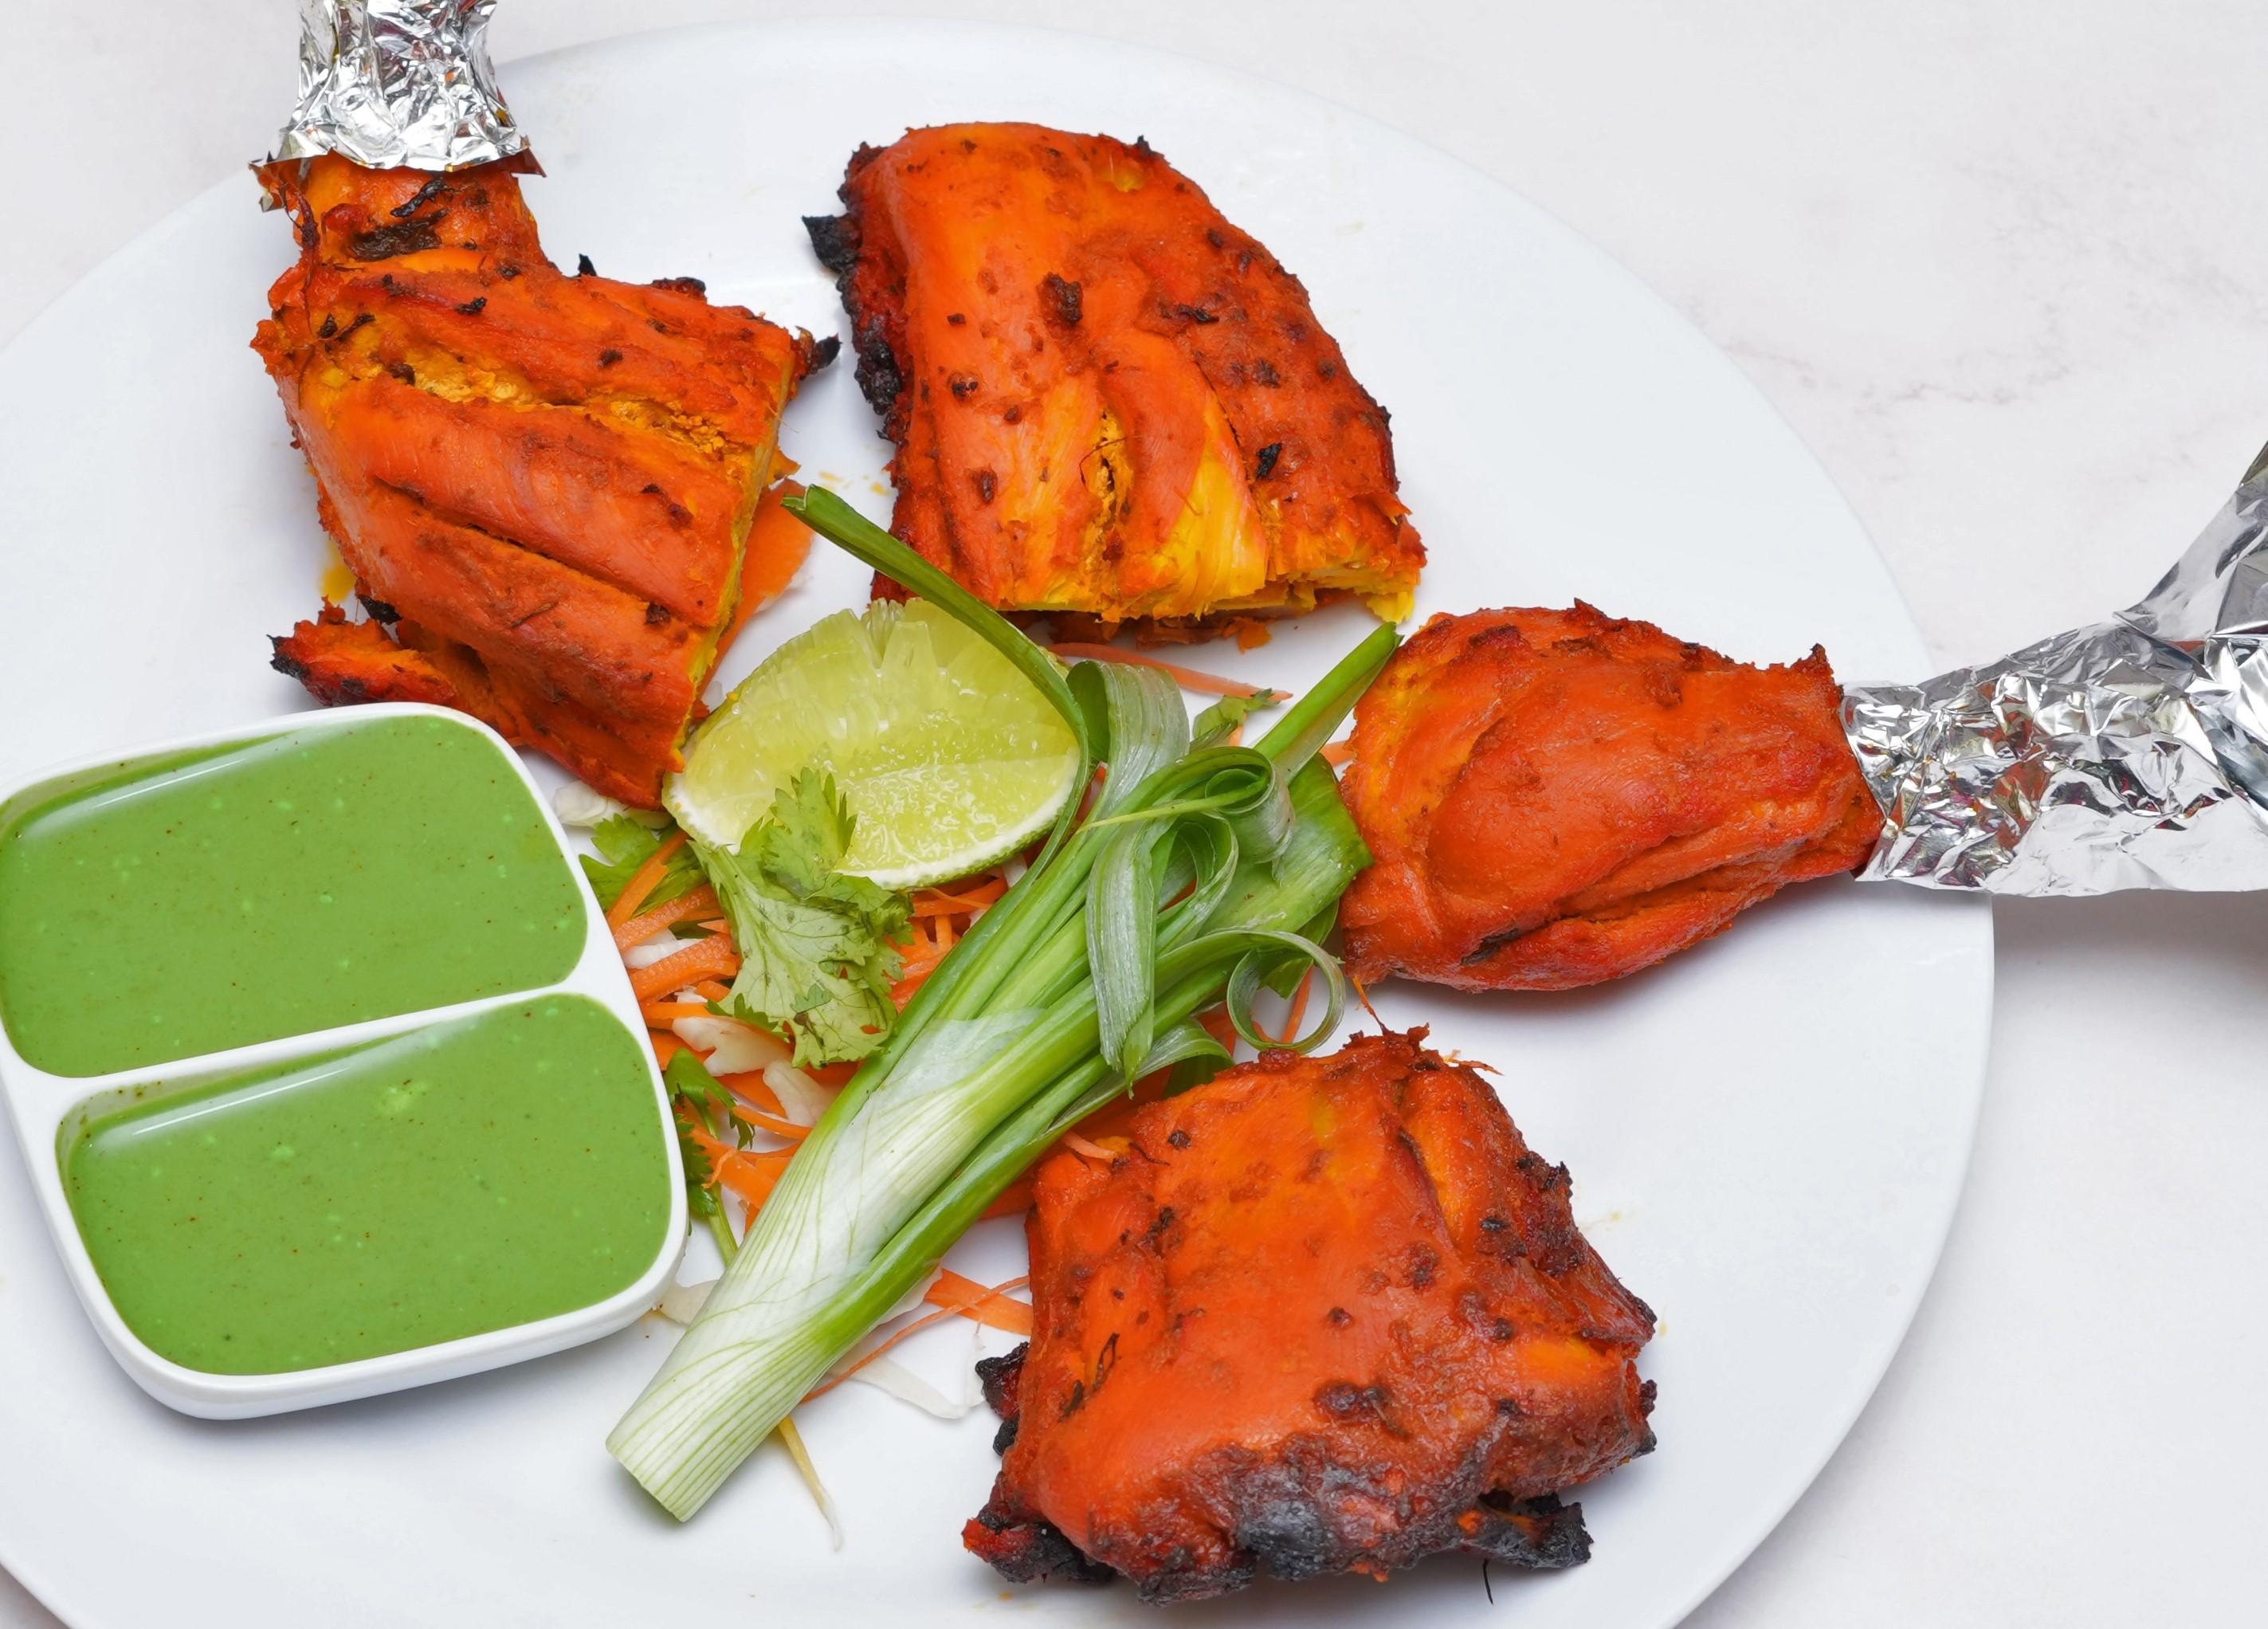 Tandoori Chicken - Half